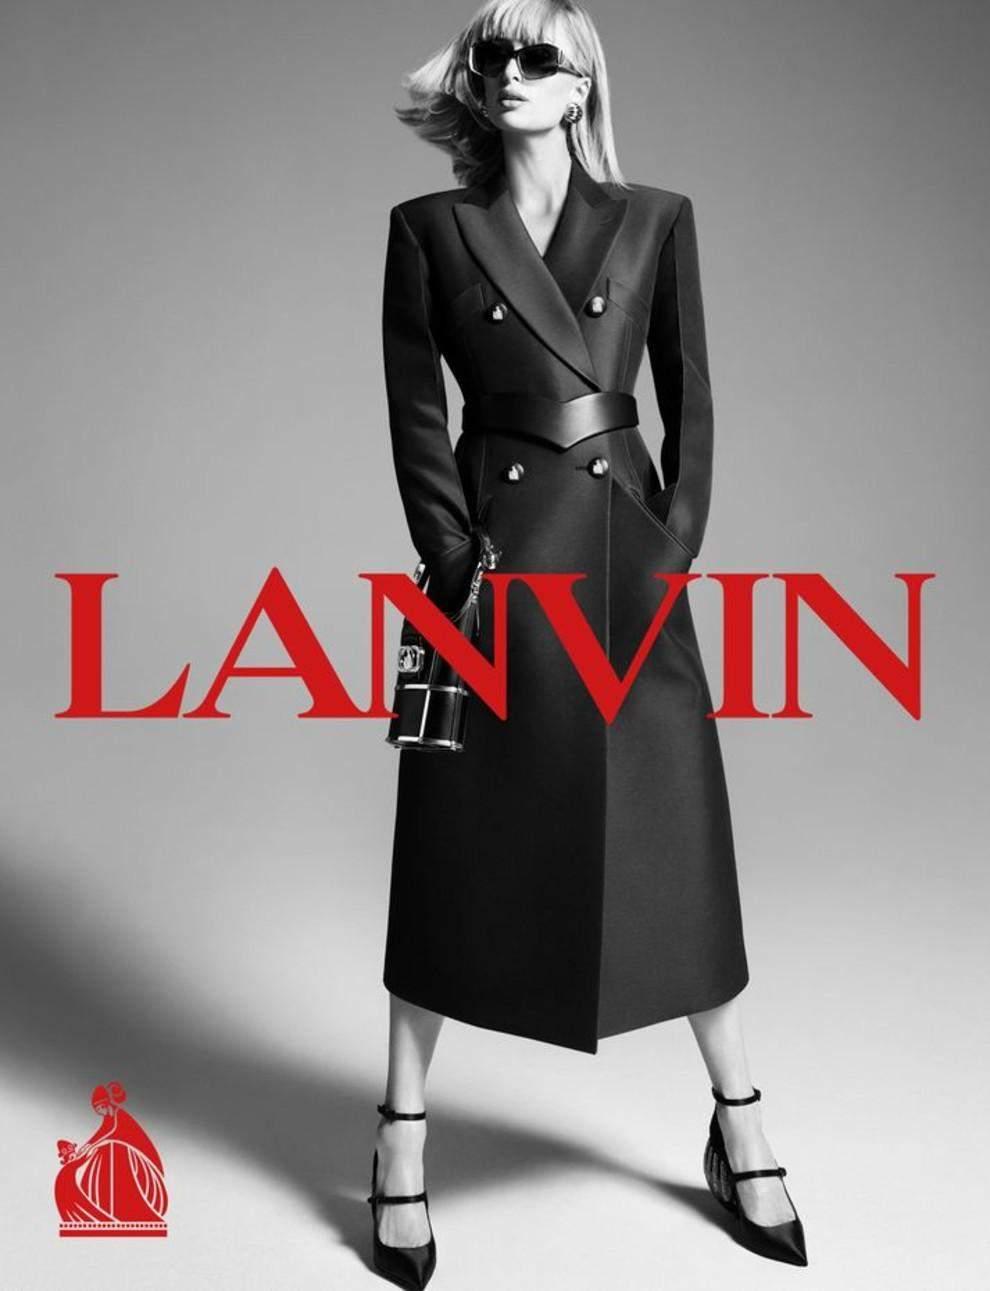 Періс Гілтон знялася у рекламі Lanvin / Vogue